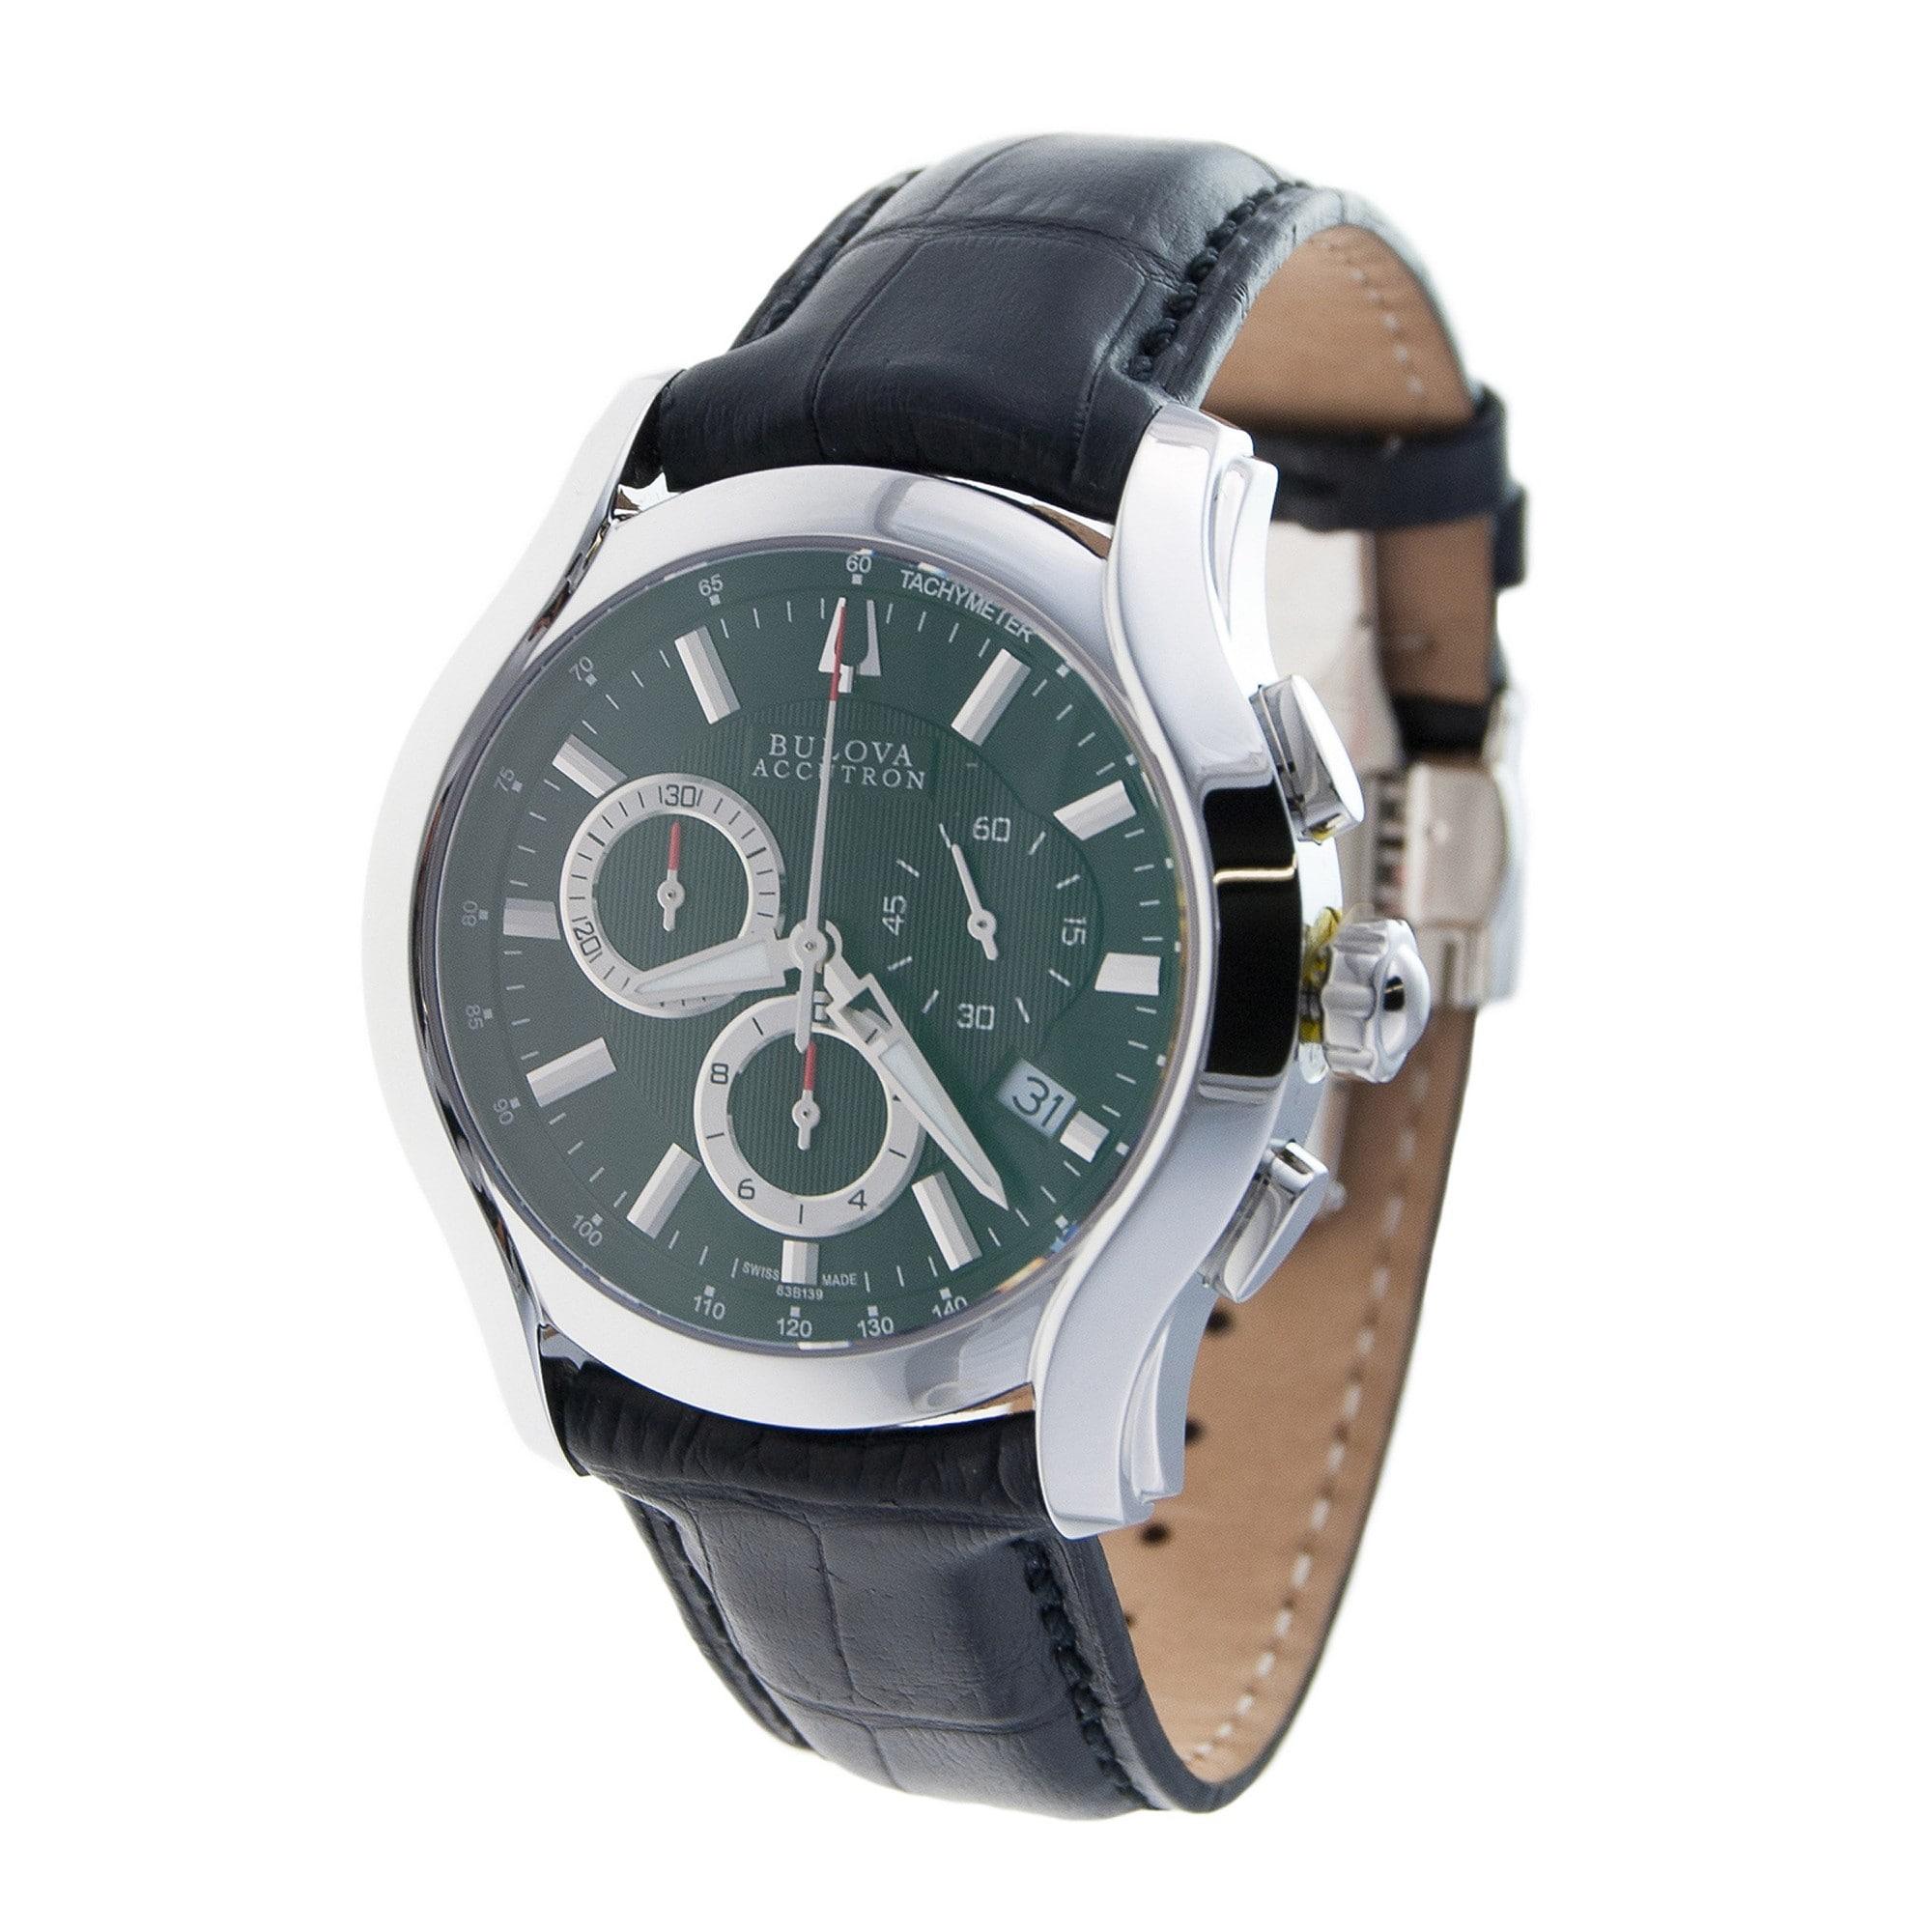 Bulova accutron men s 63b139 swiss made chronograph watch overstock